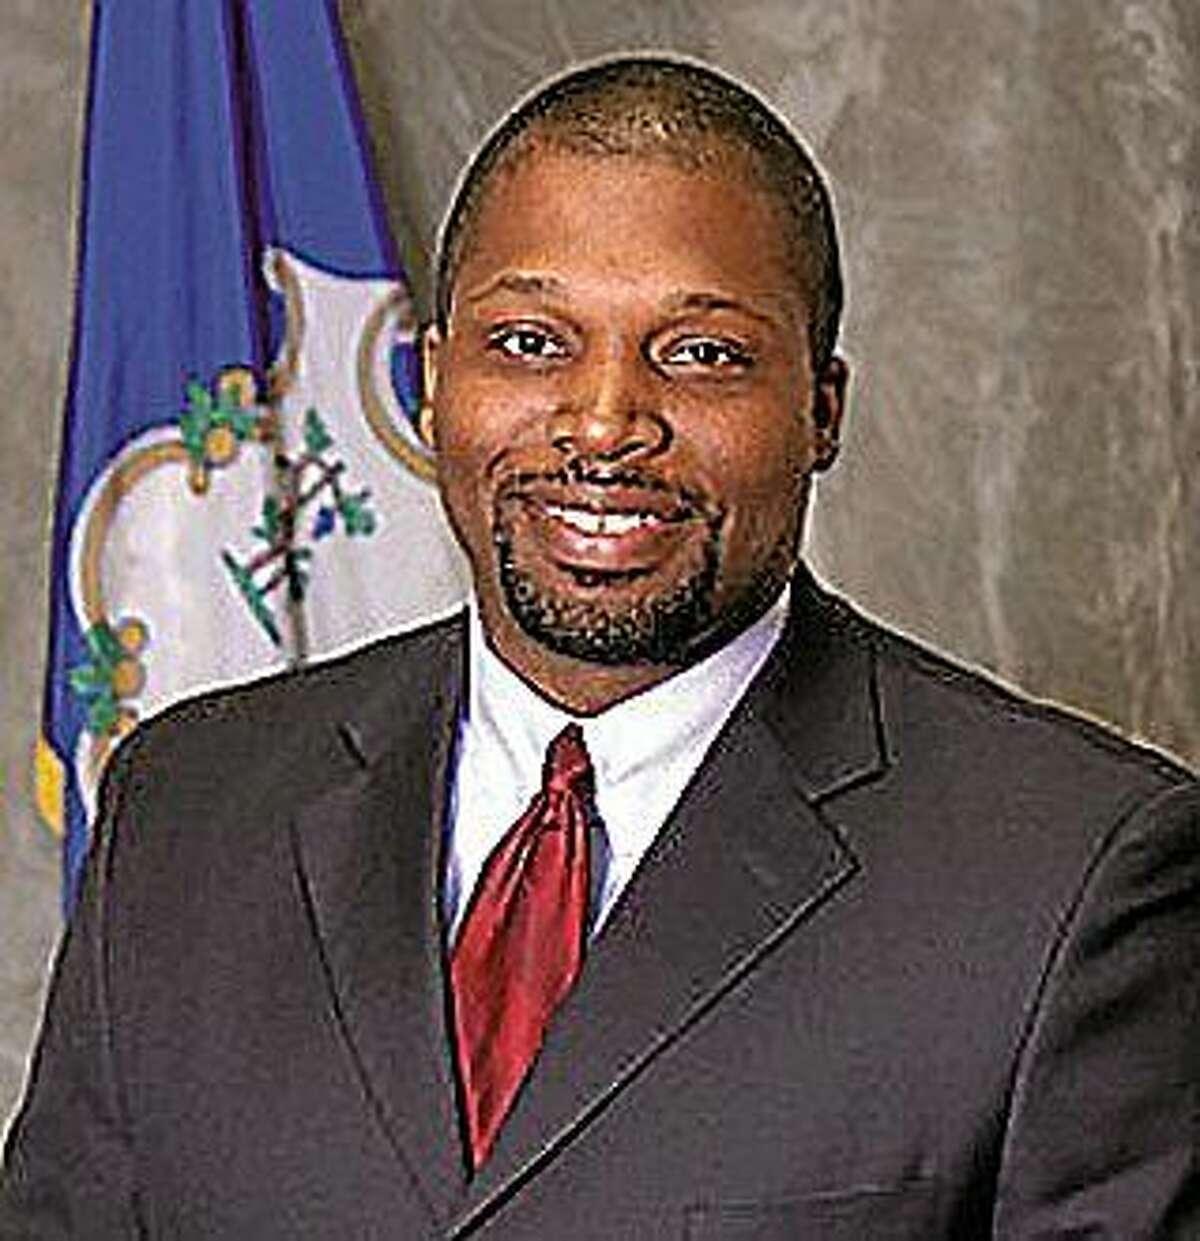 State Sen. Gary Winfield